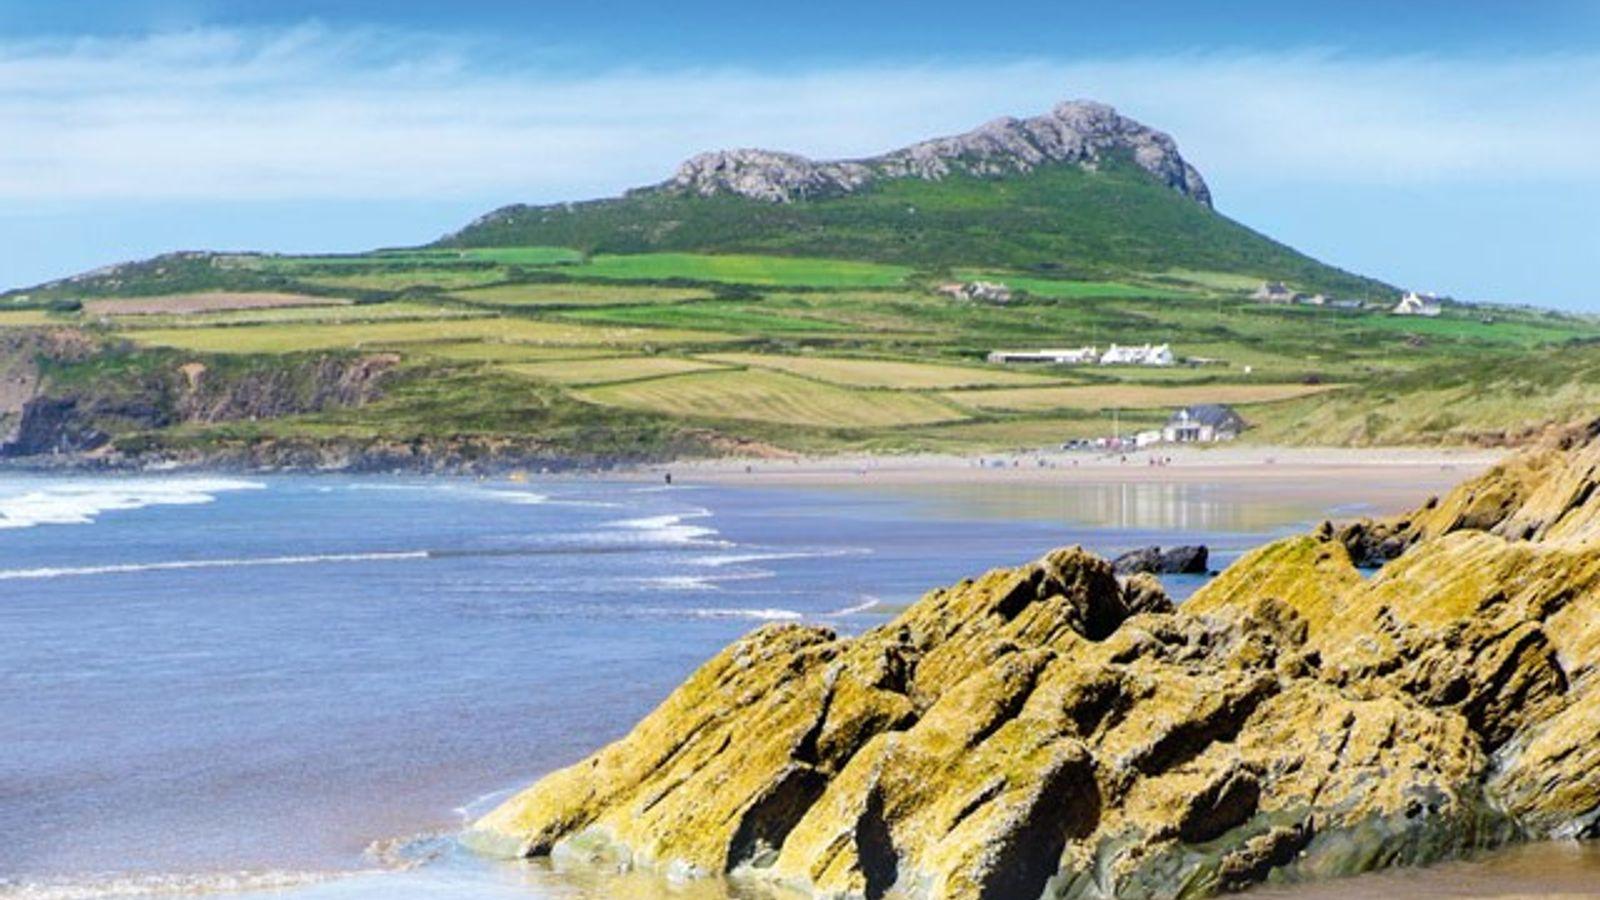 Whitesands Beach, Pembrokeshire, Wales